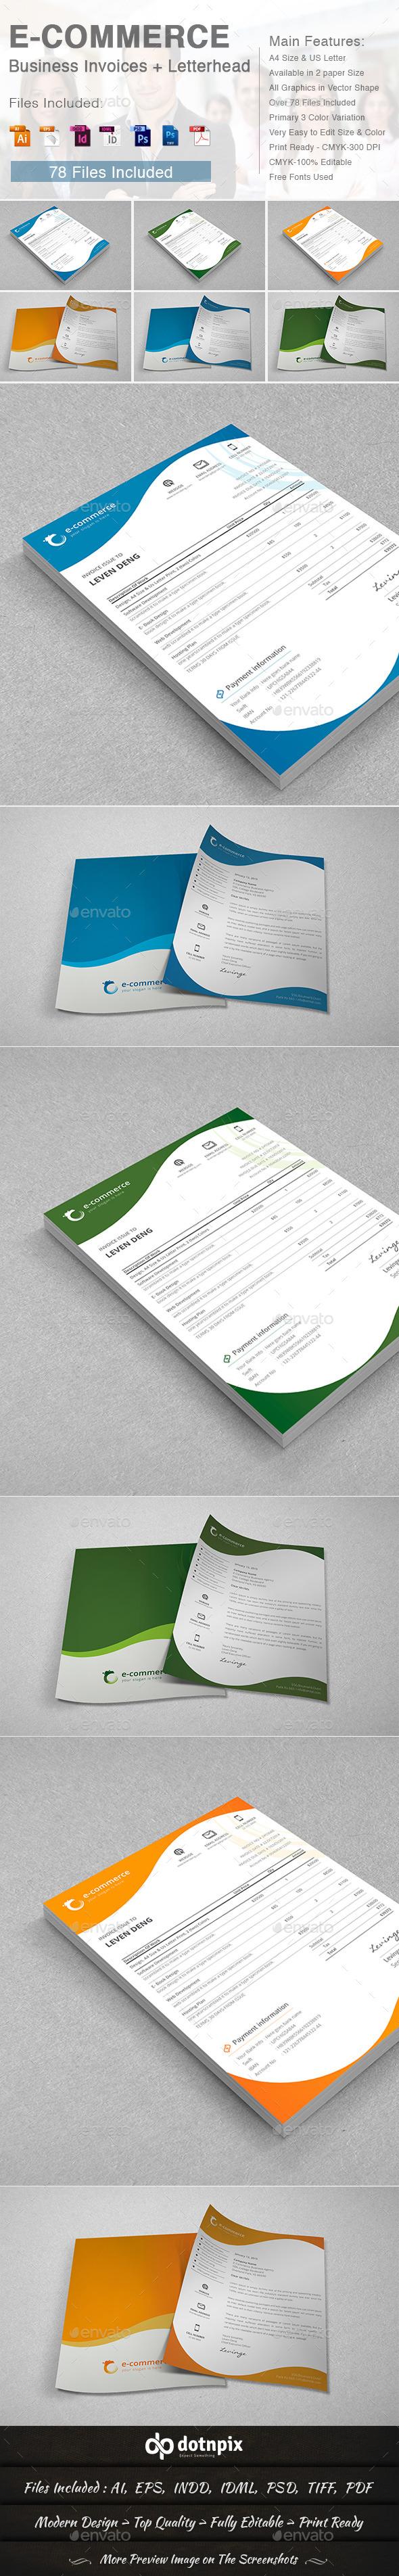 ECommerce Business Invoices  Letterhead By Dotnpix  Graphicriver